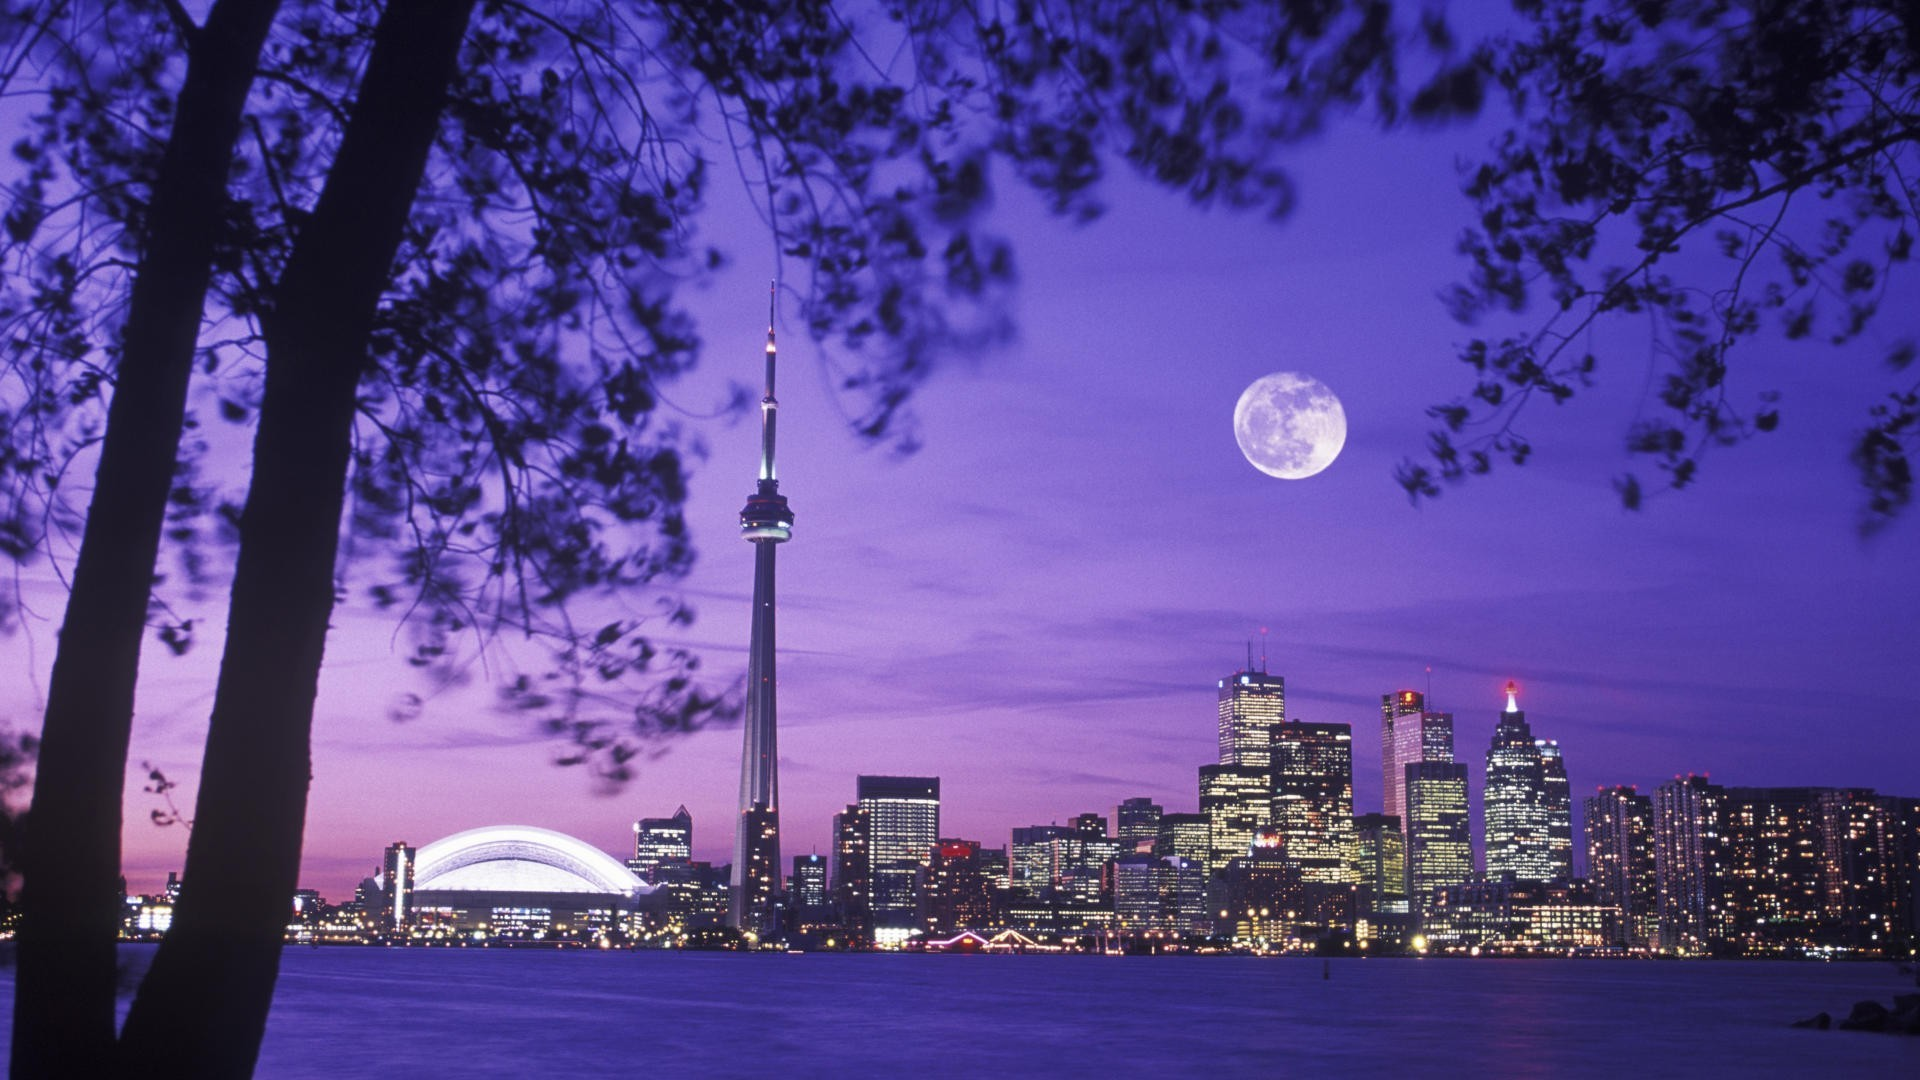 skylines-Canada-Toronto--1527064-1920x1080